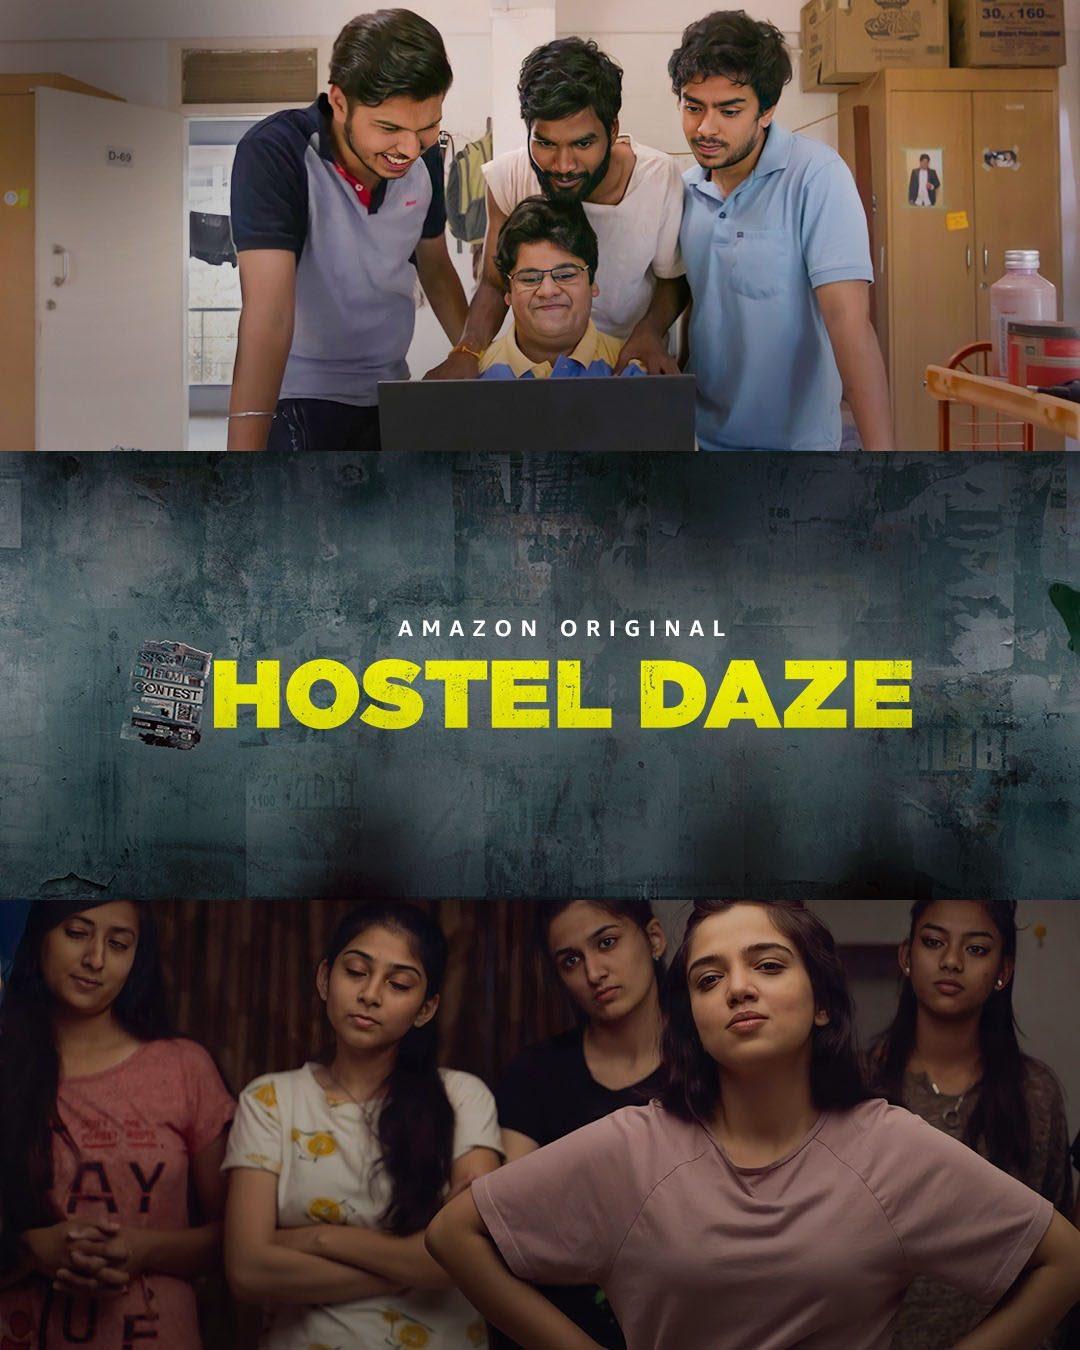 Hostel Daze (2021) S02 Hindi Comedy Series All Episodes